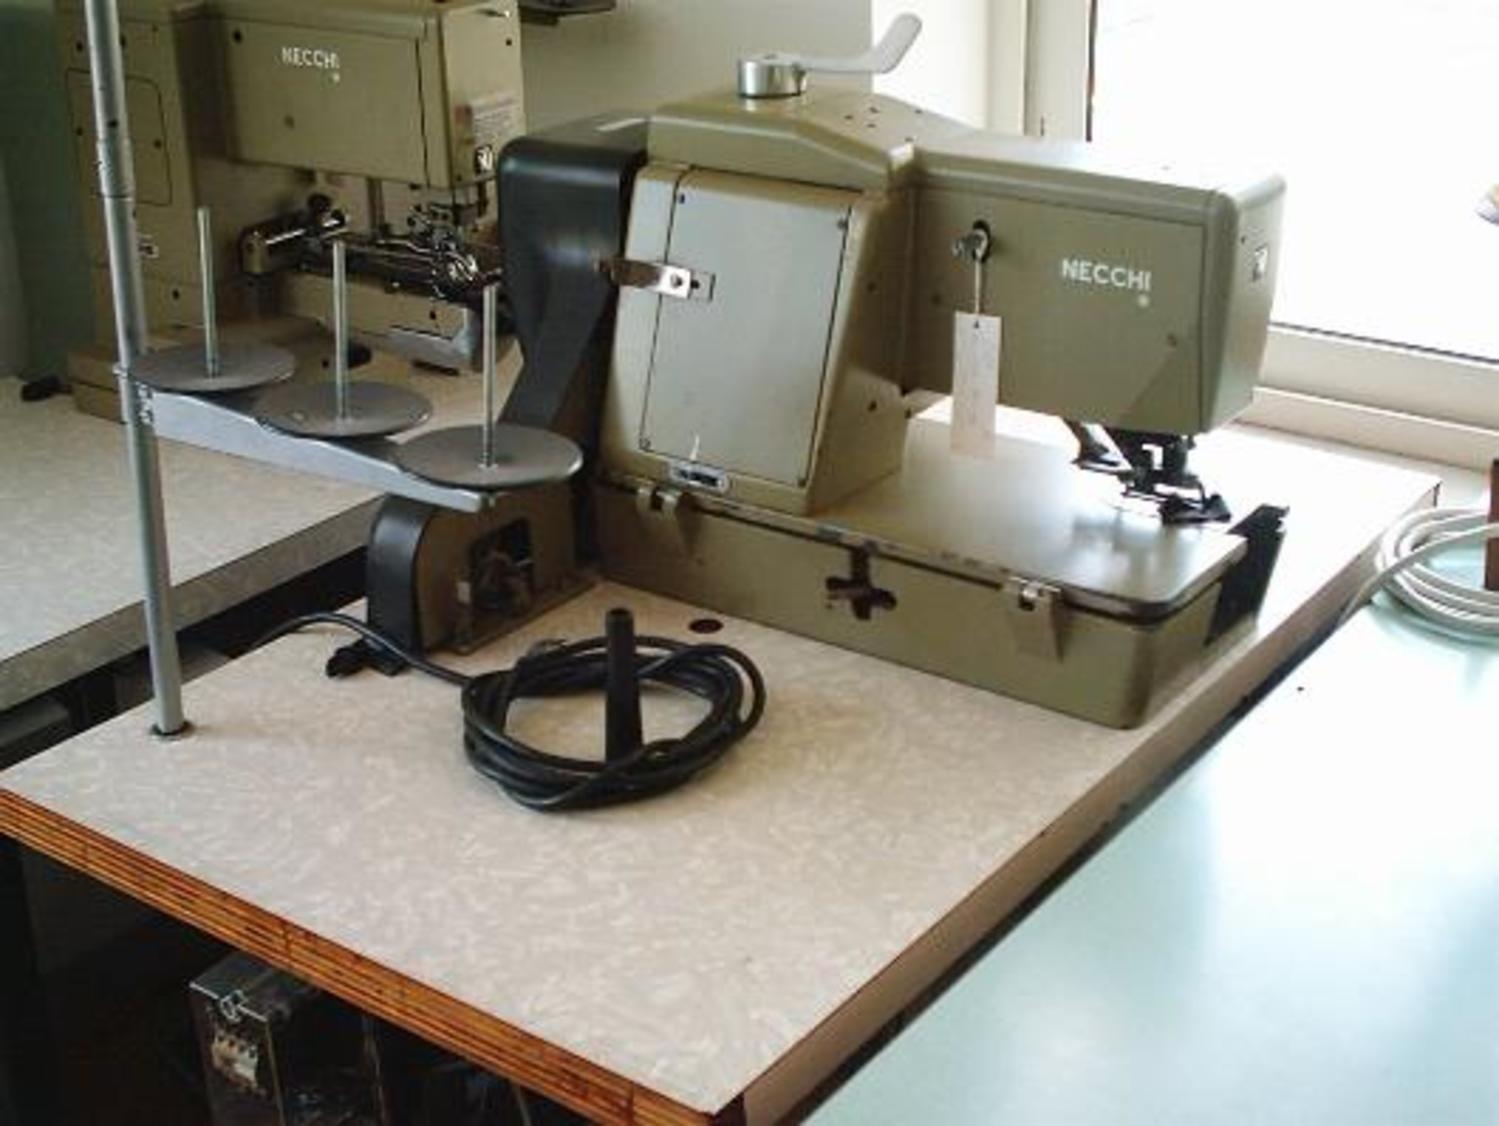 Nähmaschine Necchi 402-110